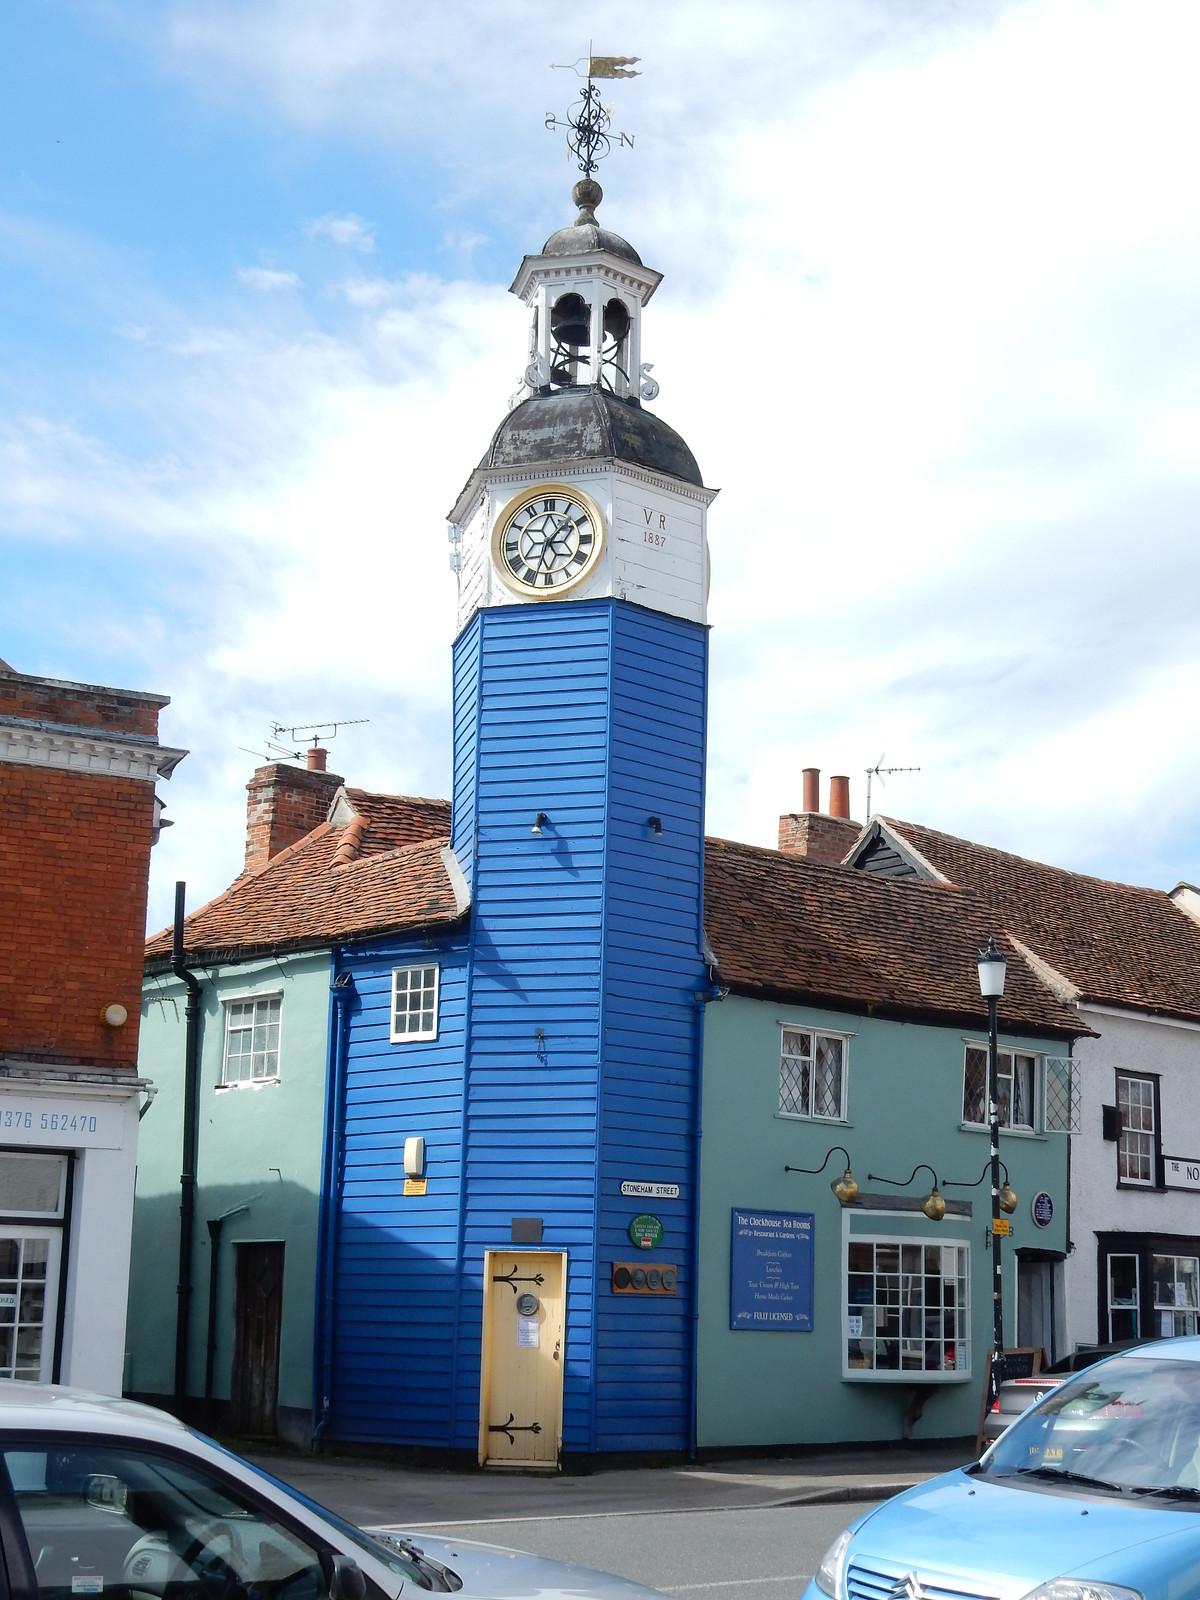 Clockhouse, Coggeshall Kelvedon Circular